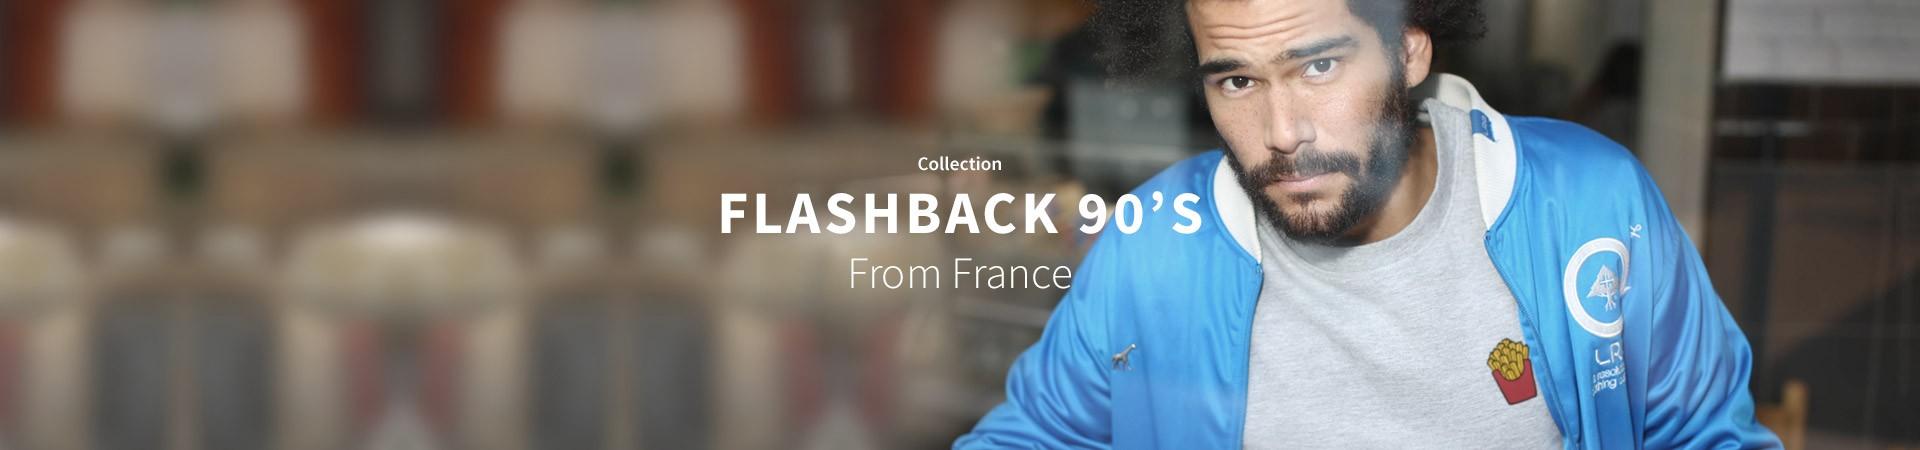 Flashback 90's